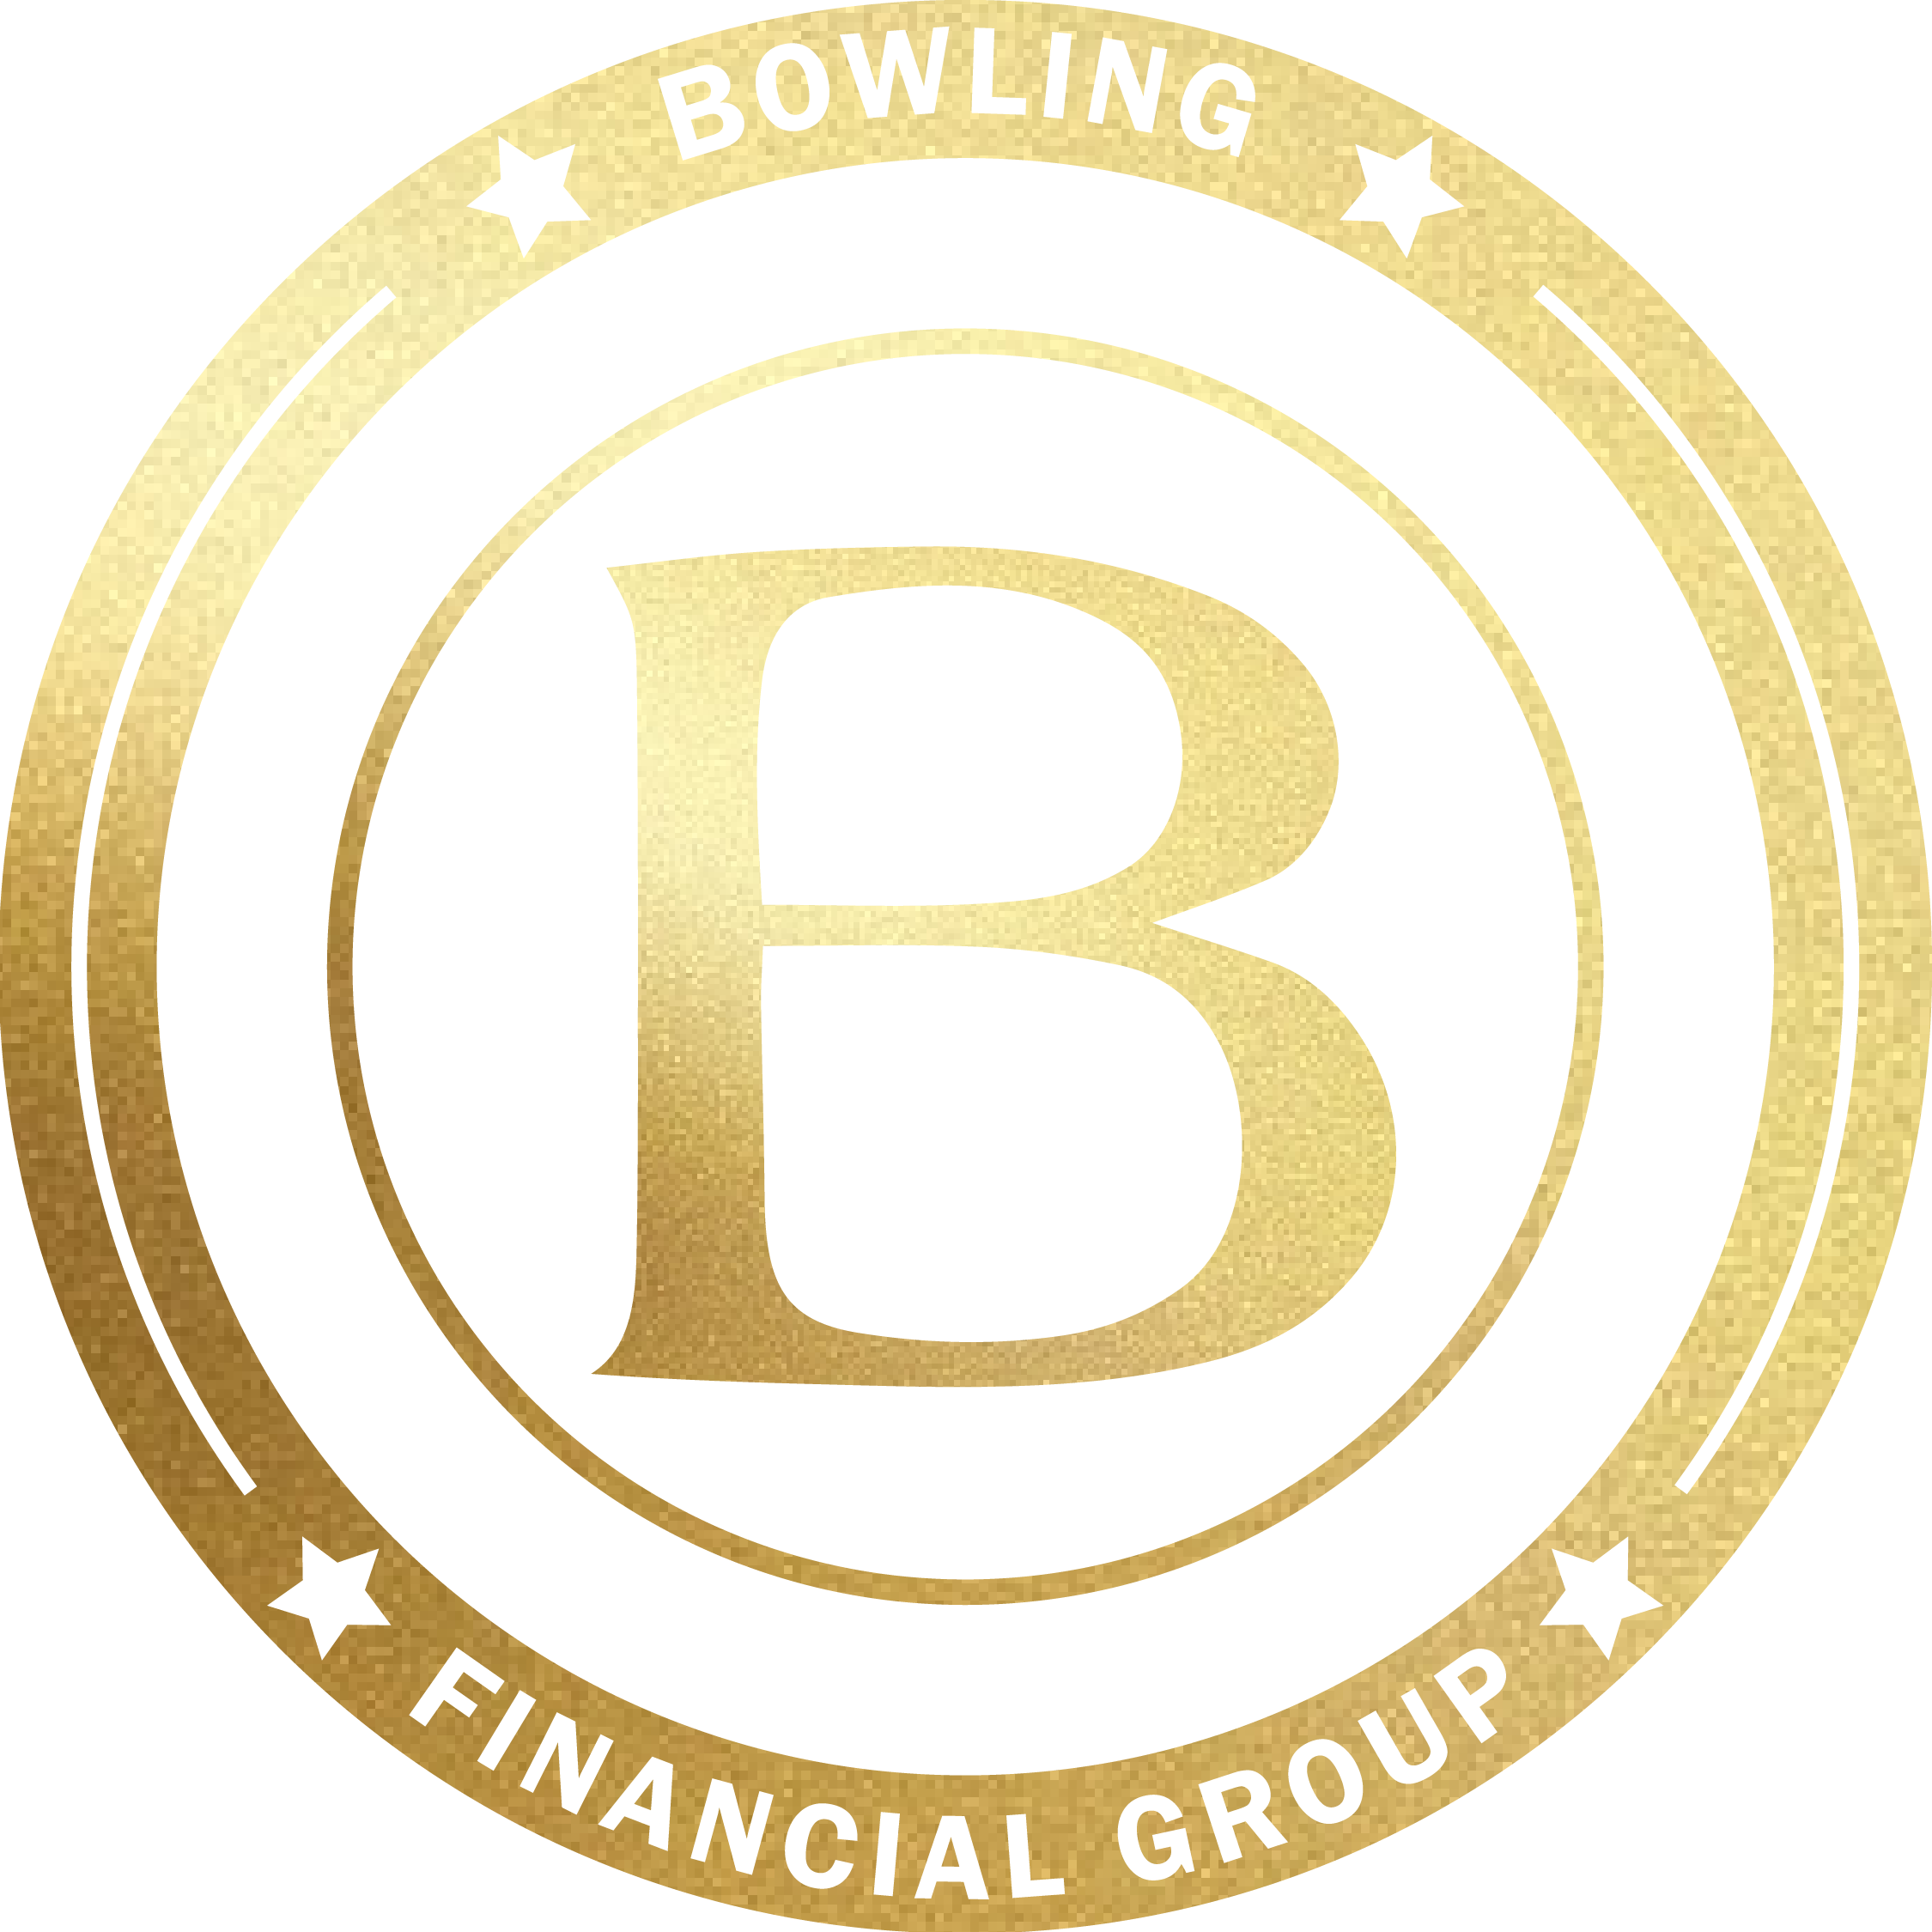 Bowling Financial Group